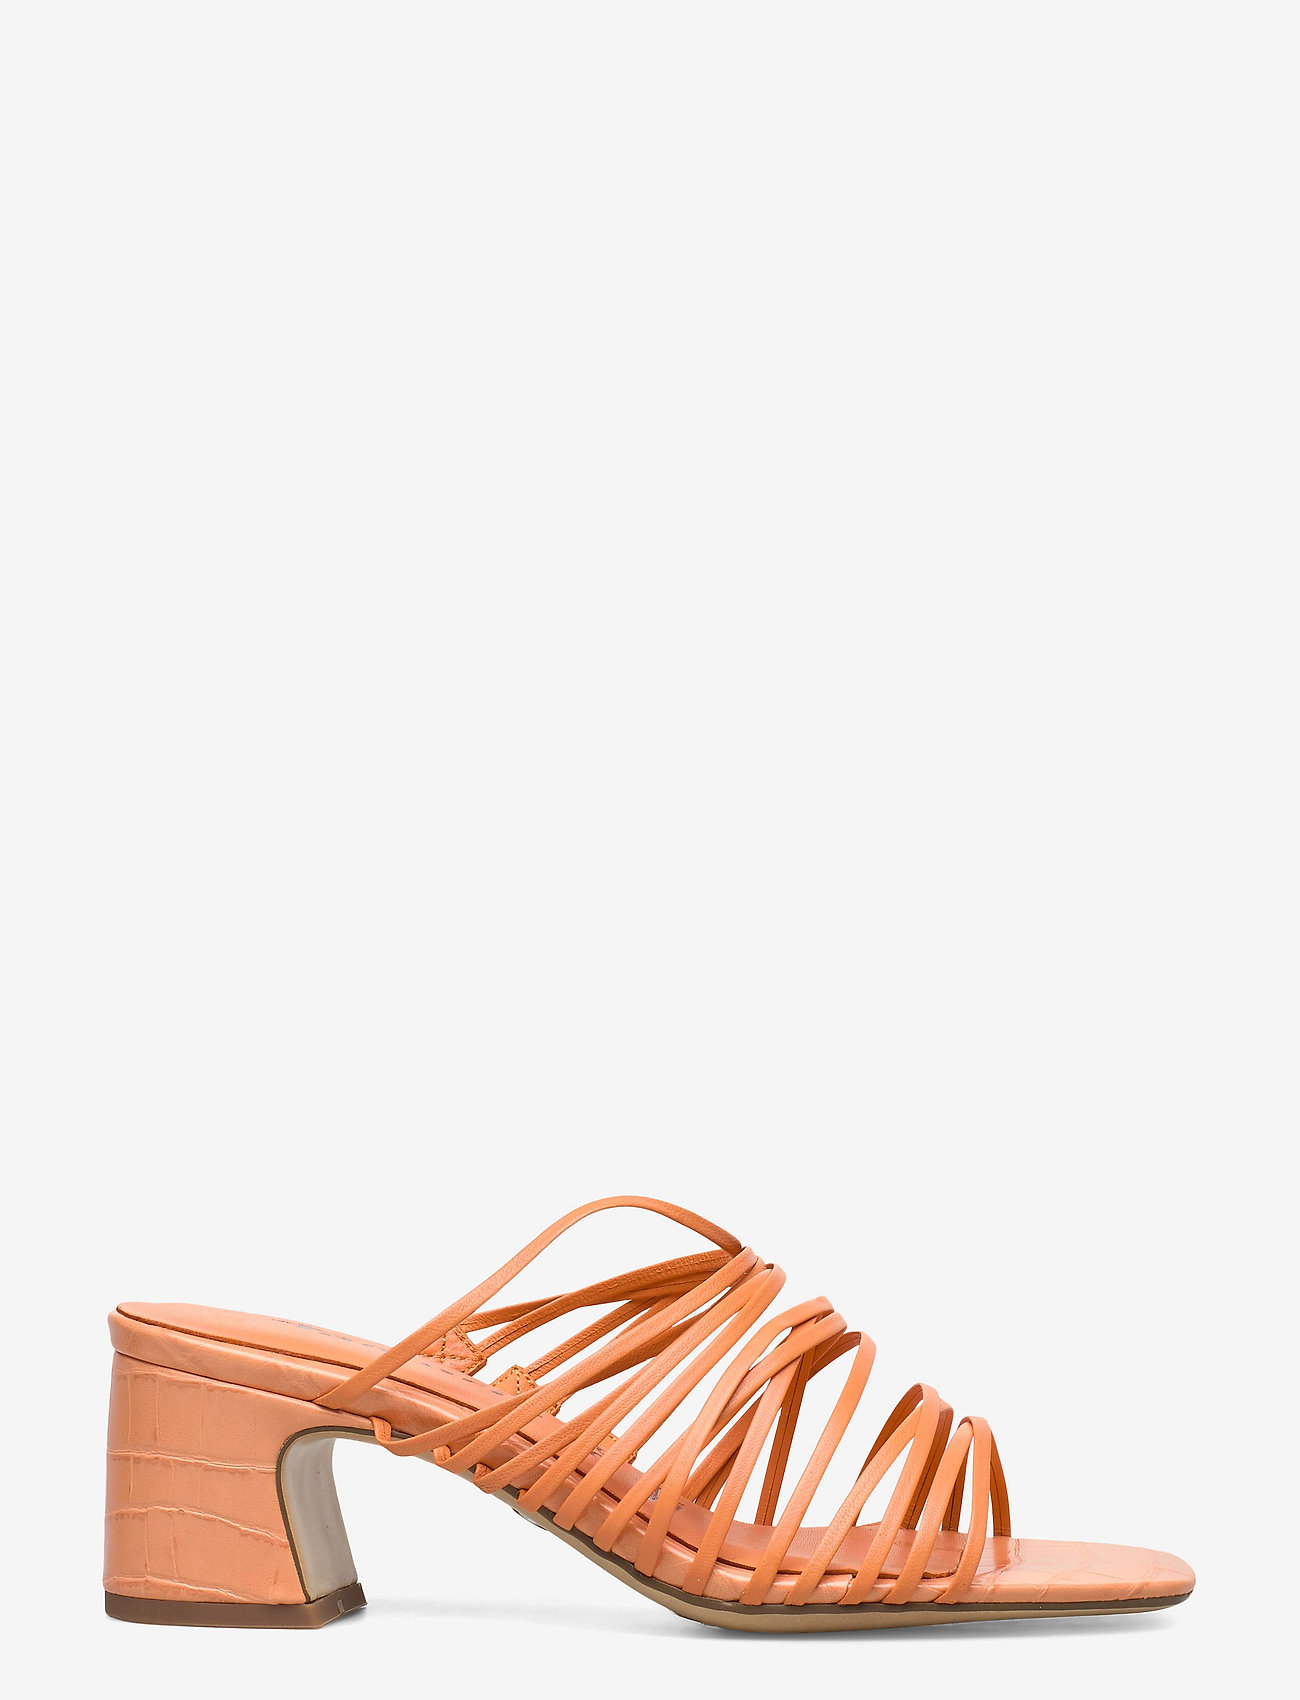 Woms Slides (Peach Neon) (34.97 €) - Tamaris j4zRa